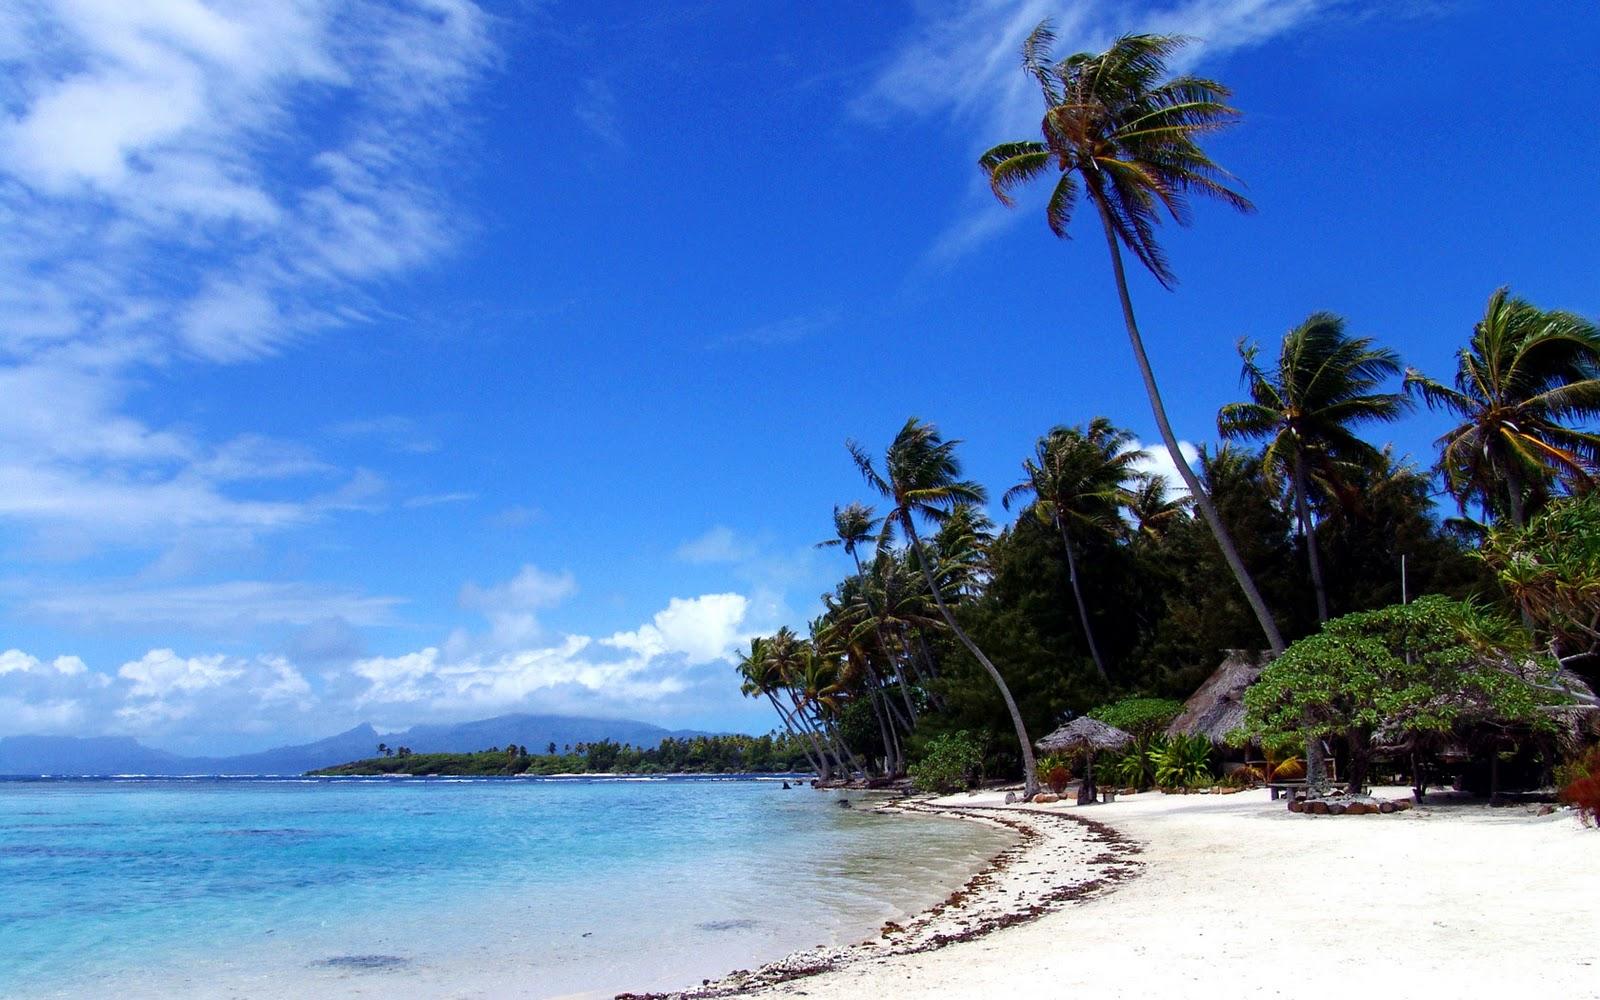 http://2.bp.blogspot.com/_EbZ6Jho2i70/TK5ODxafGVI/AAAAAAAAAKw/F6twYHlNcUQ/s1600/windy-day-on-tropic-beach-wallpaper-1680x1050.jpg